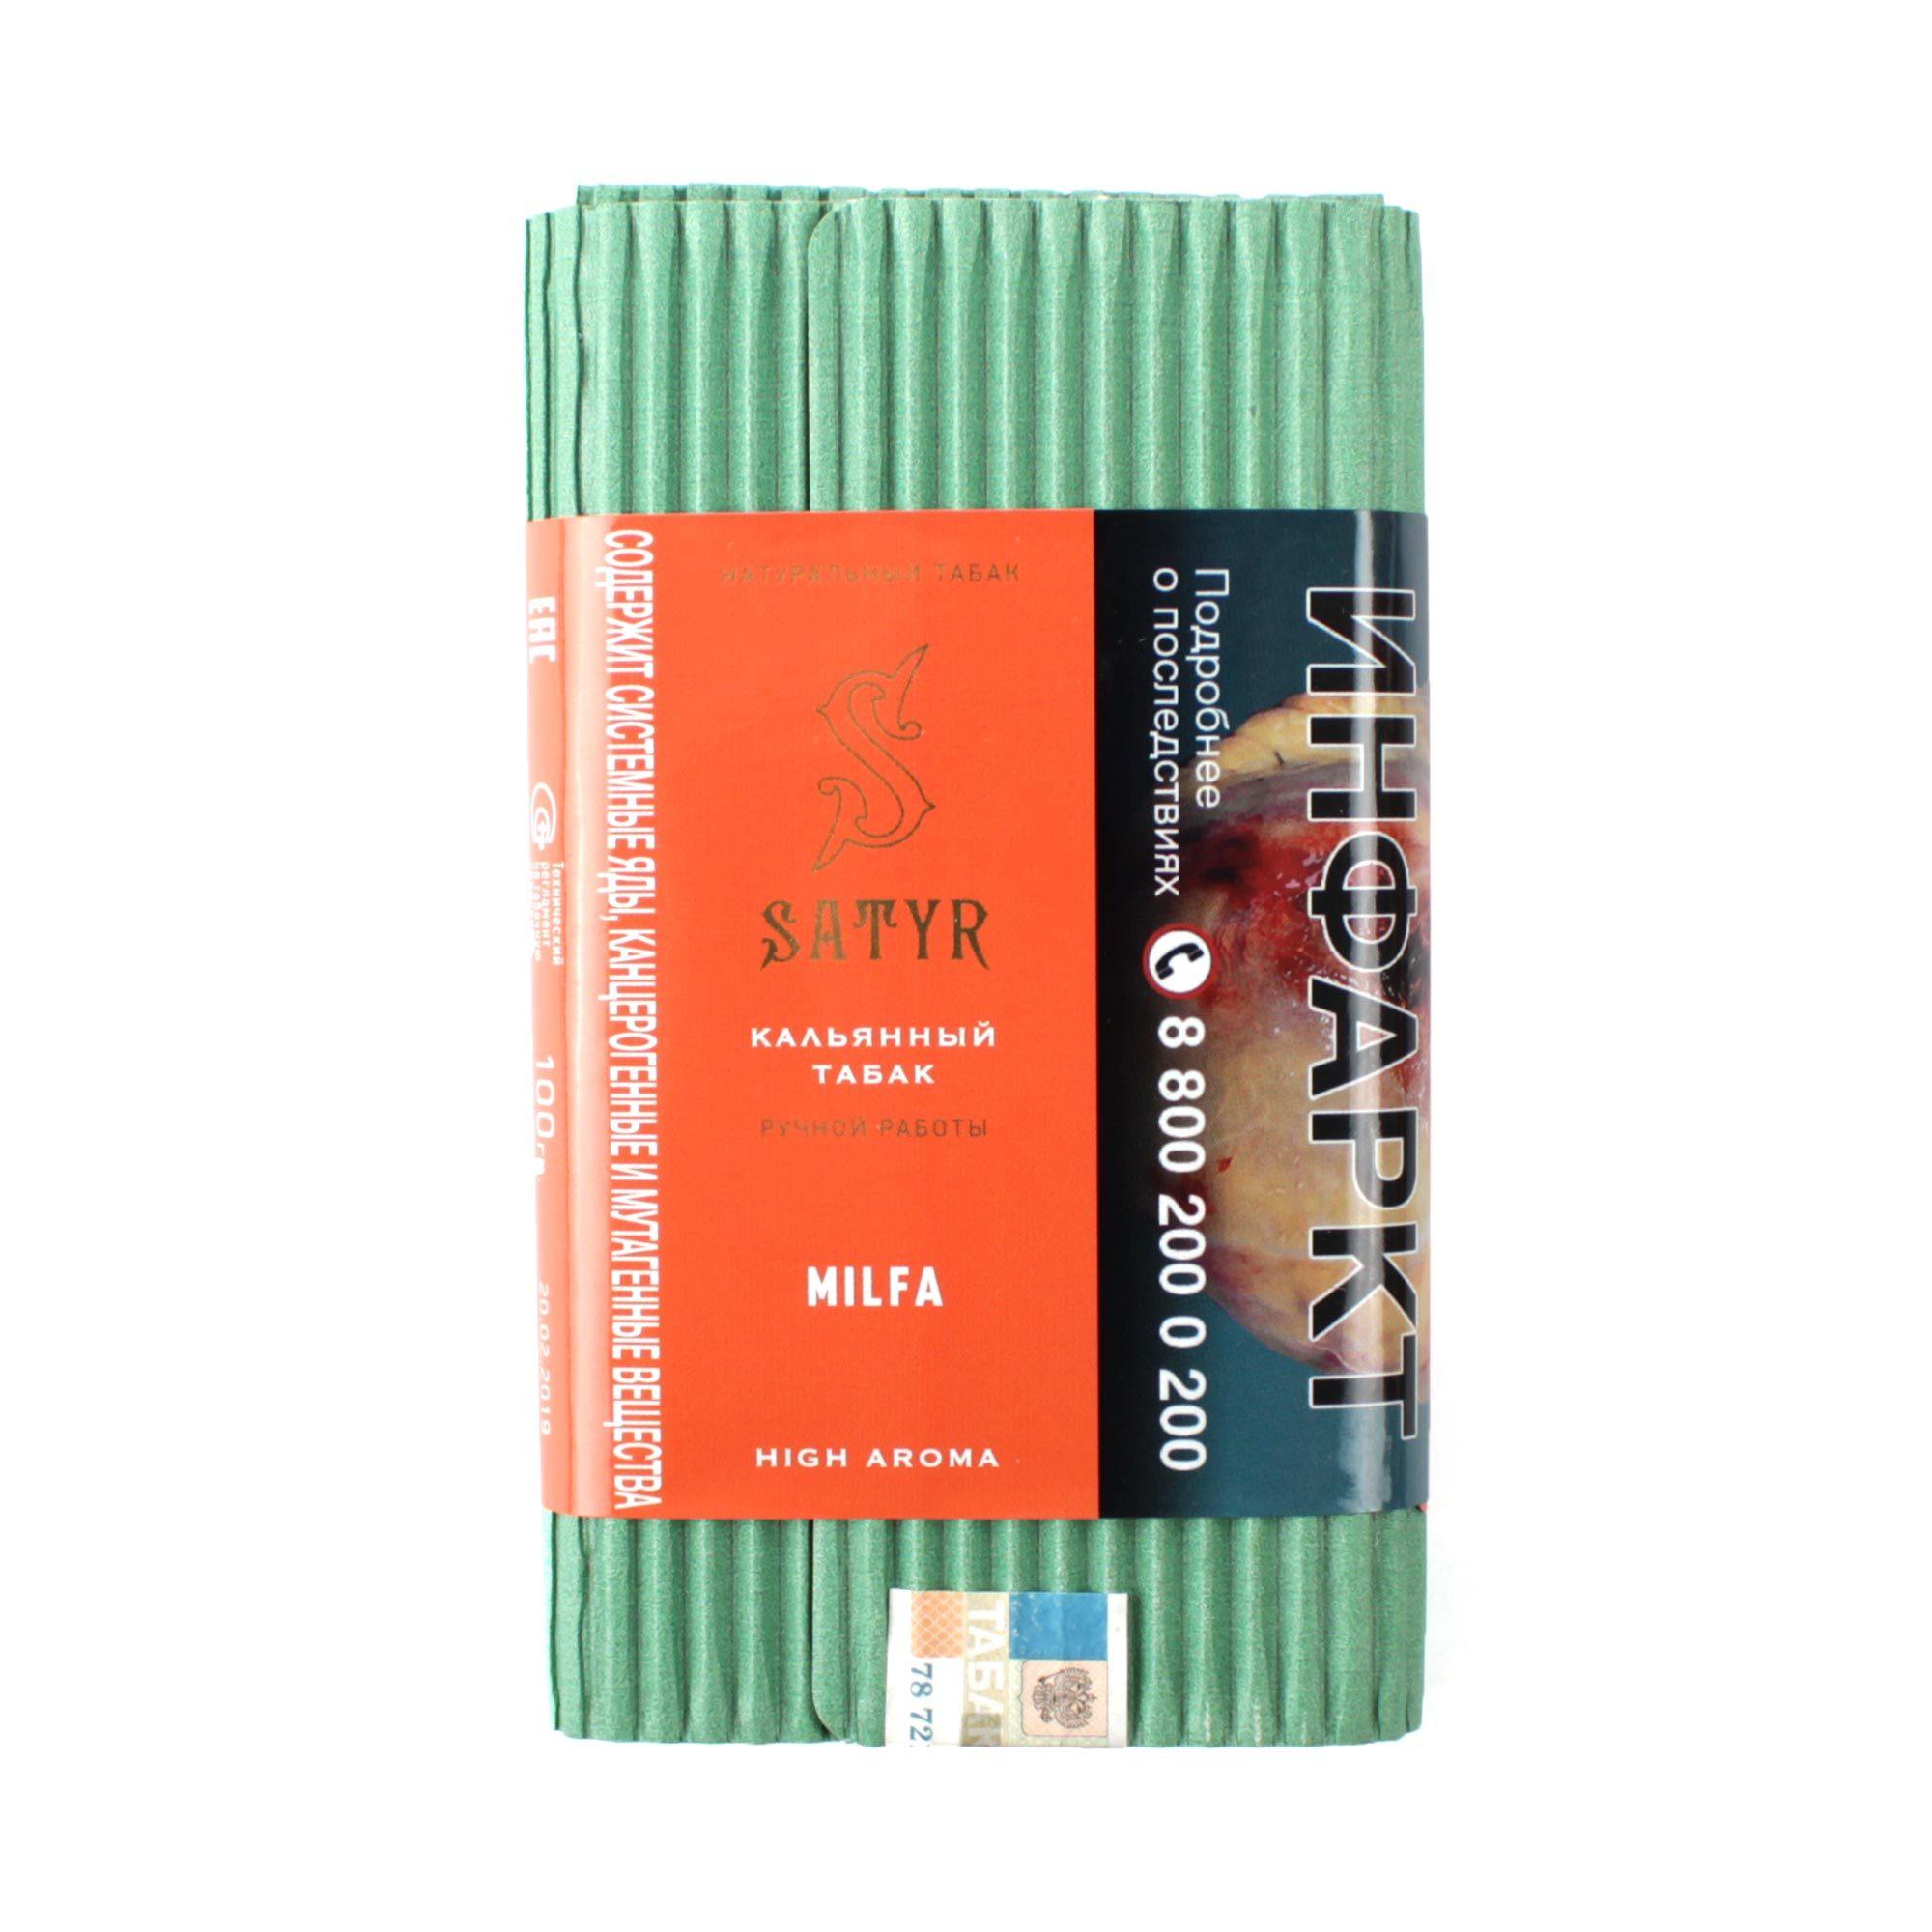 Табак для кальяна Satyr High Aroma 100 гр Milfa